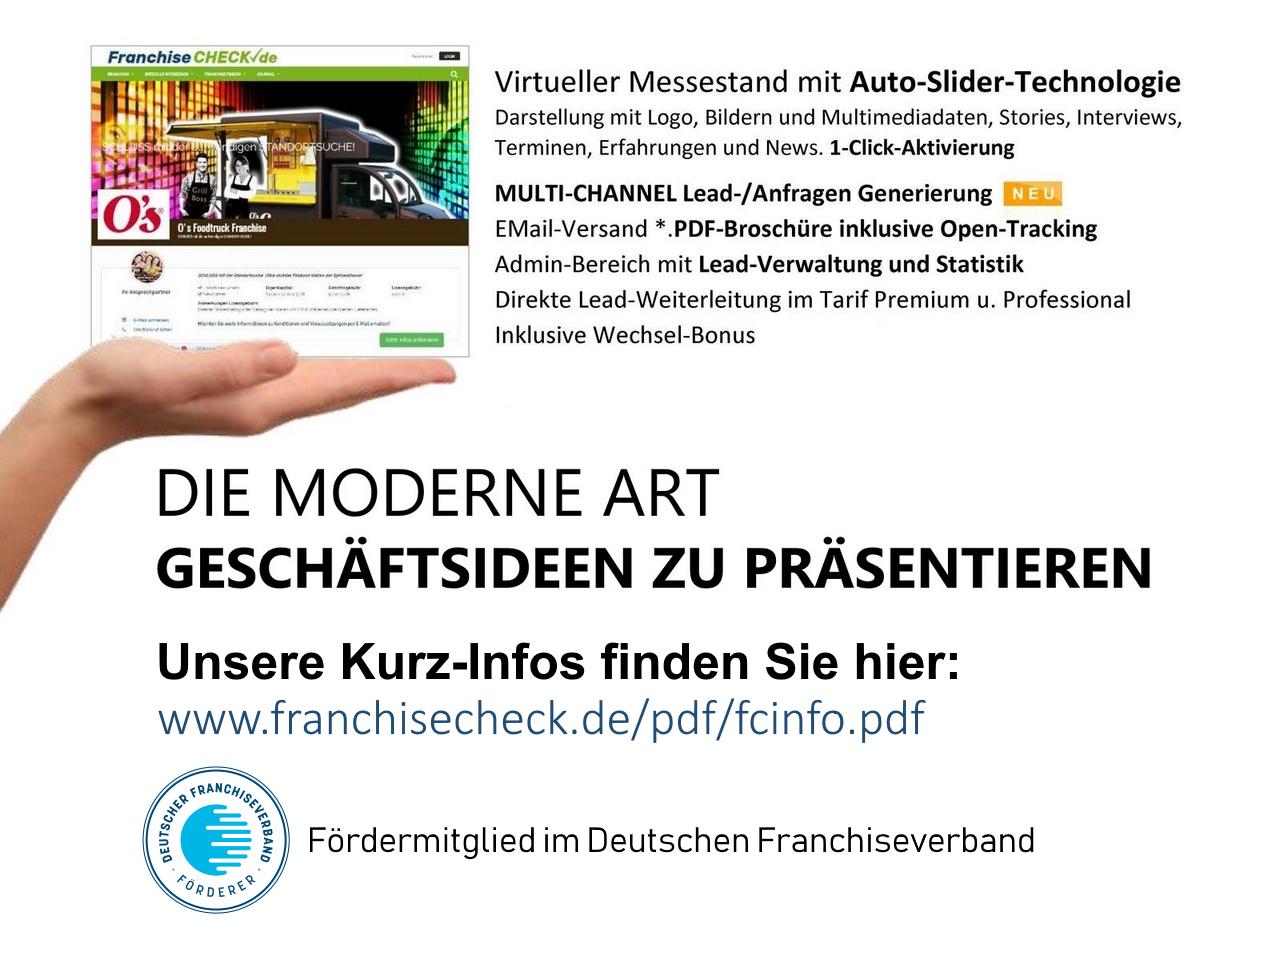 FranchiseCHECK.de - das Franchiseportal mit Franchisedirekt-Aufruf